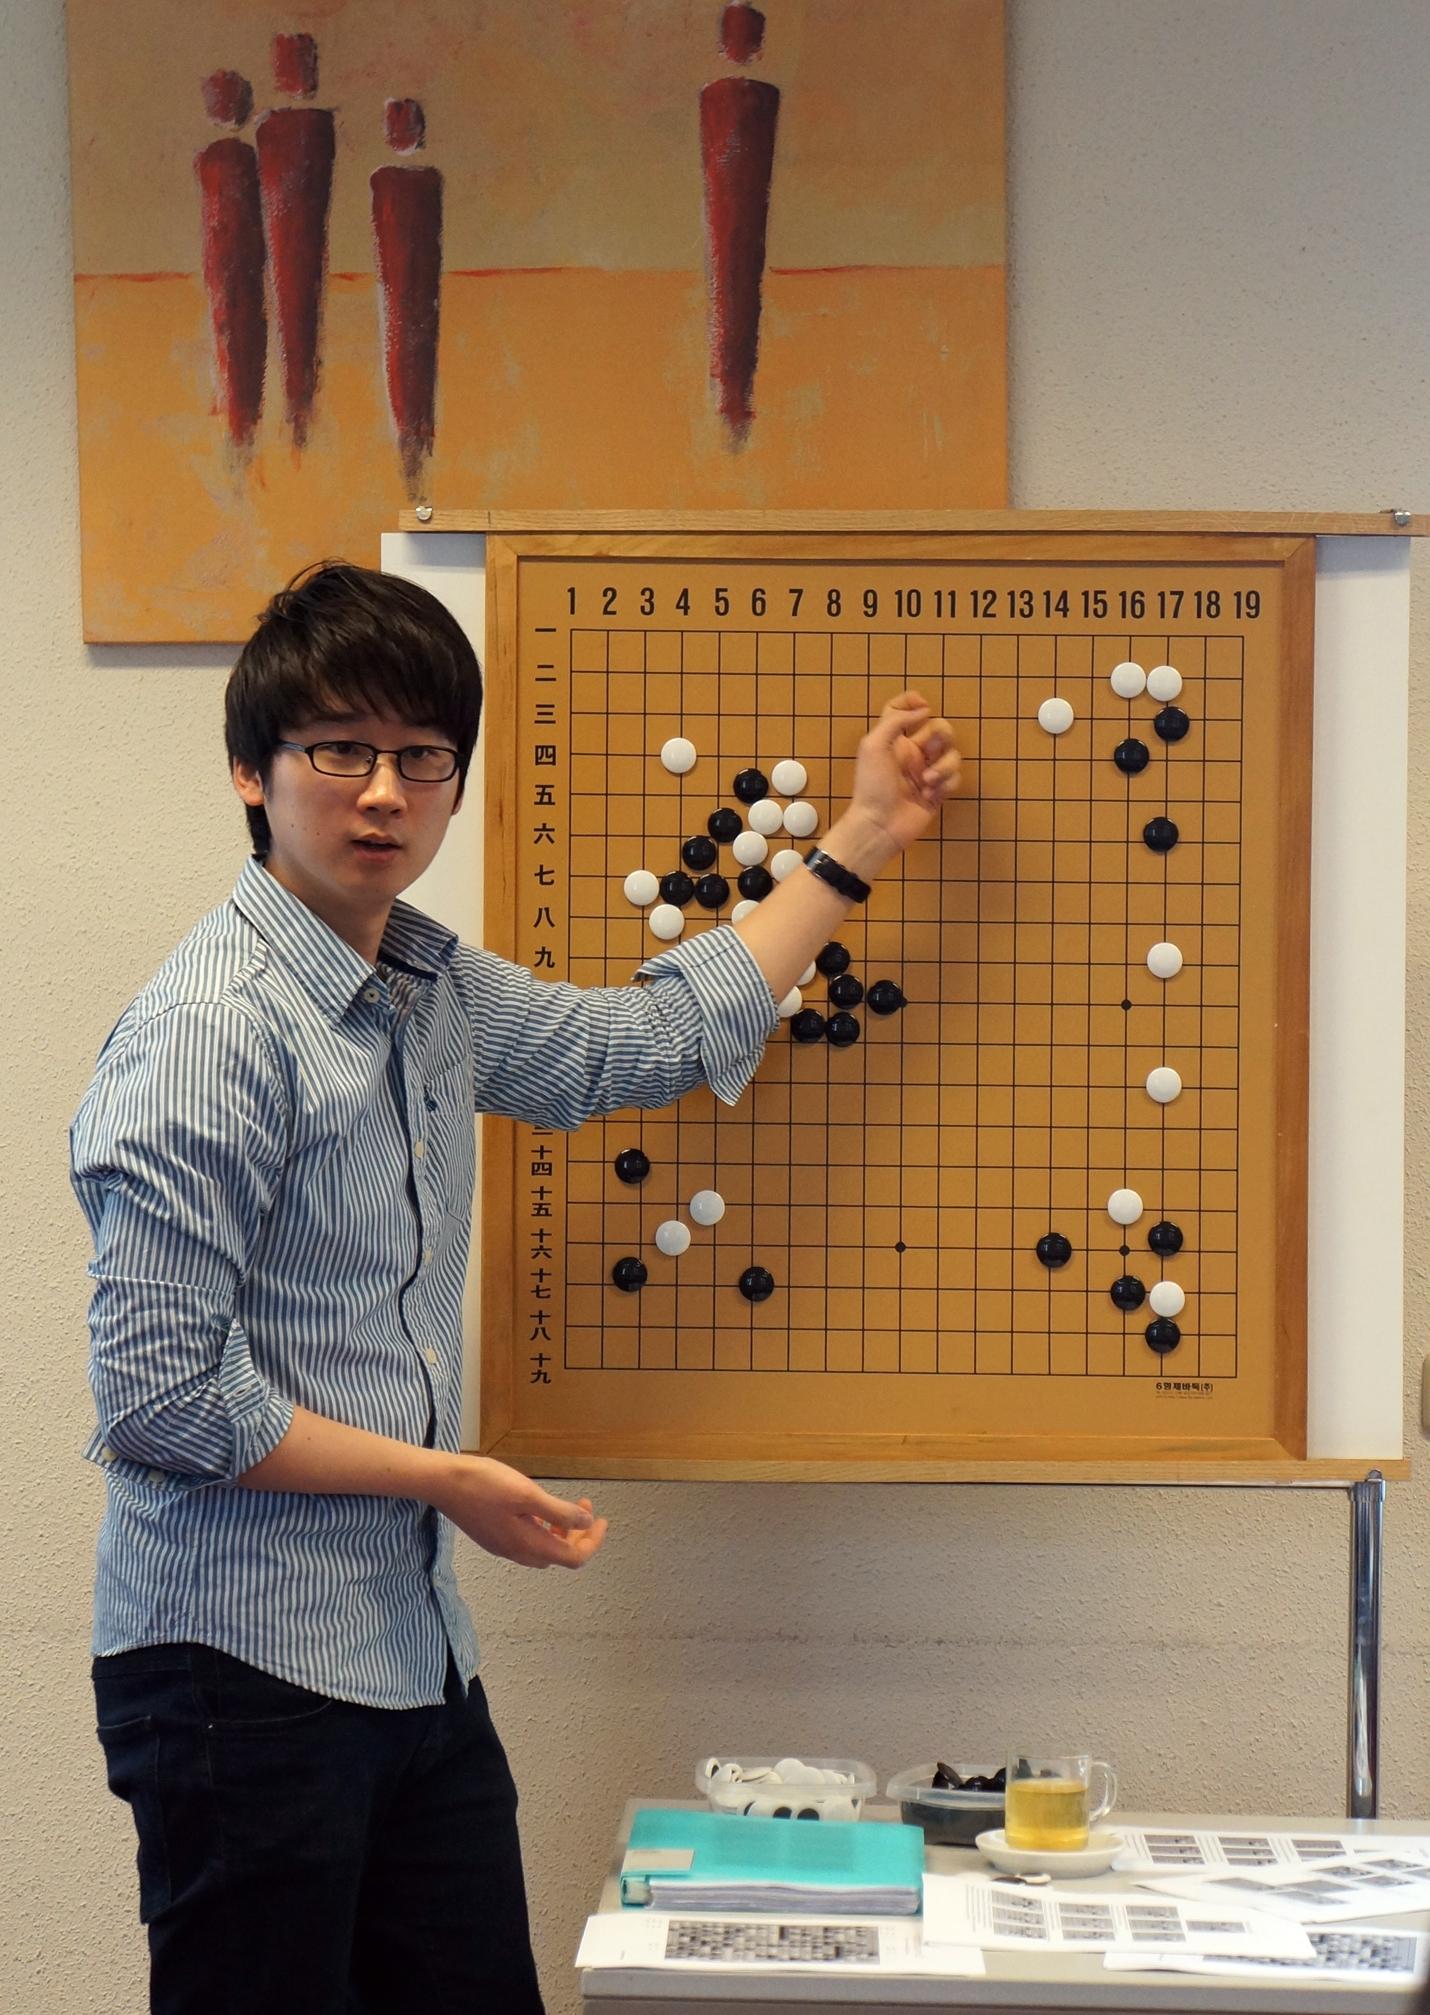 http://www.yunguseng.com/pics/inseong_teaching_2.jpg